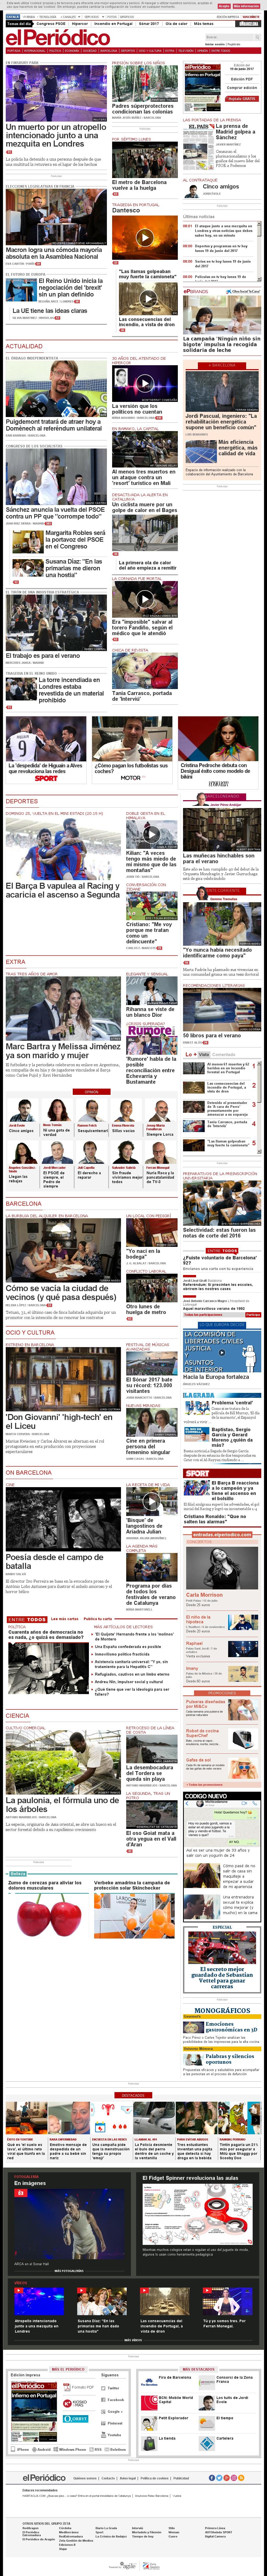 El Periodico at Monday June 19, 2017, 6:15 a.m. UTC